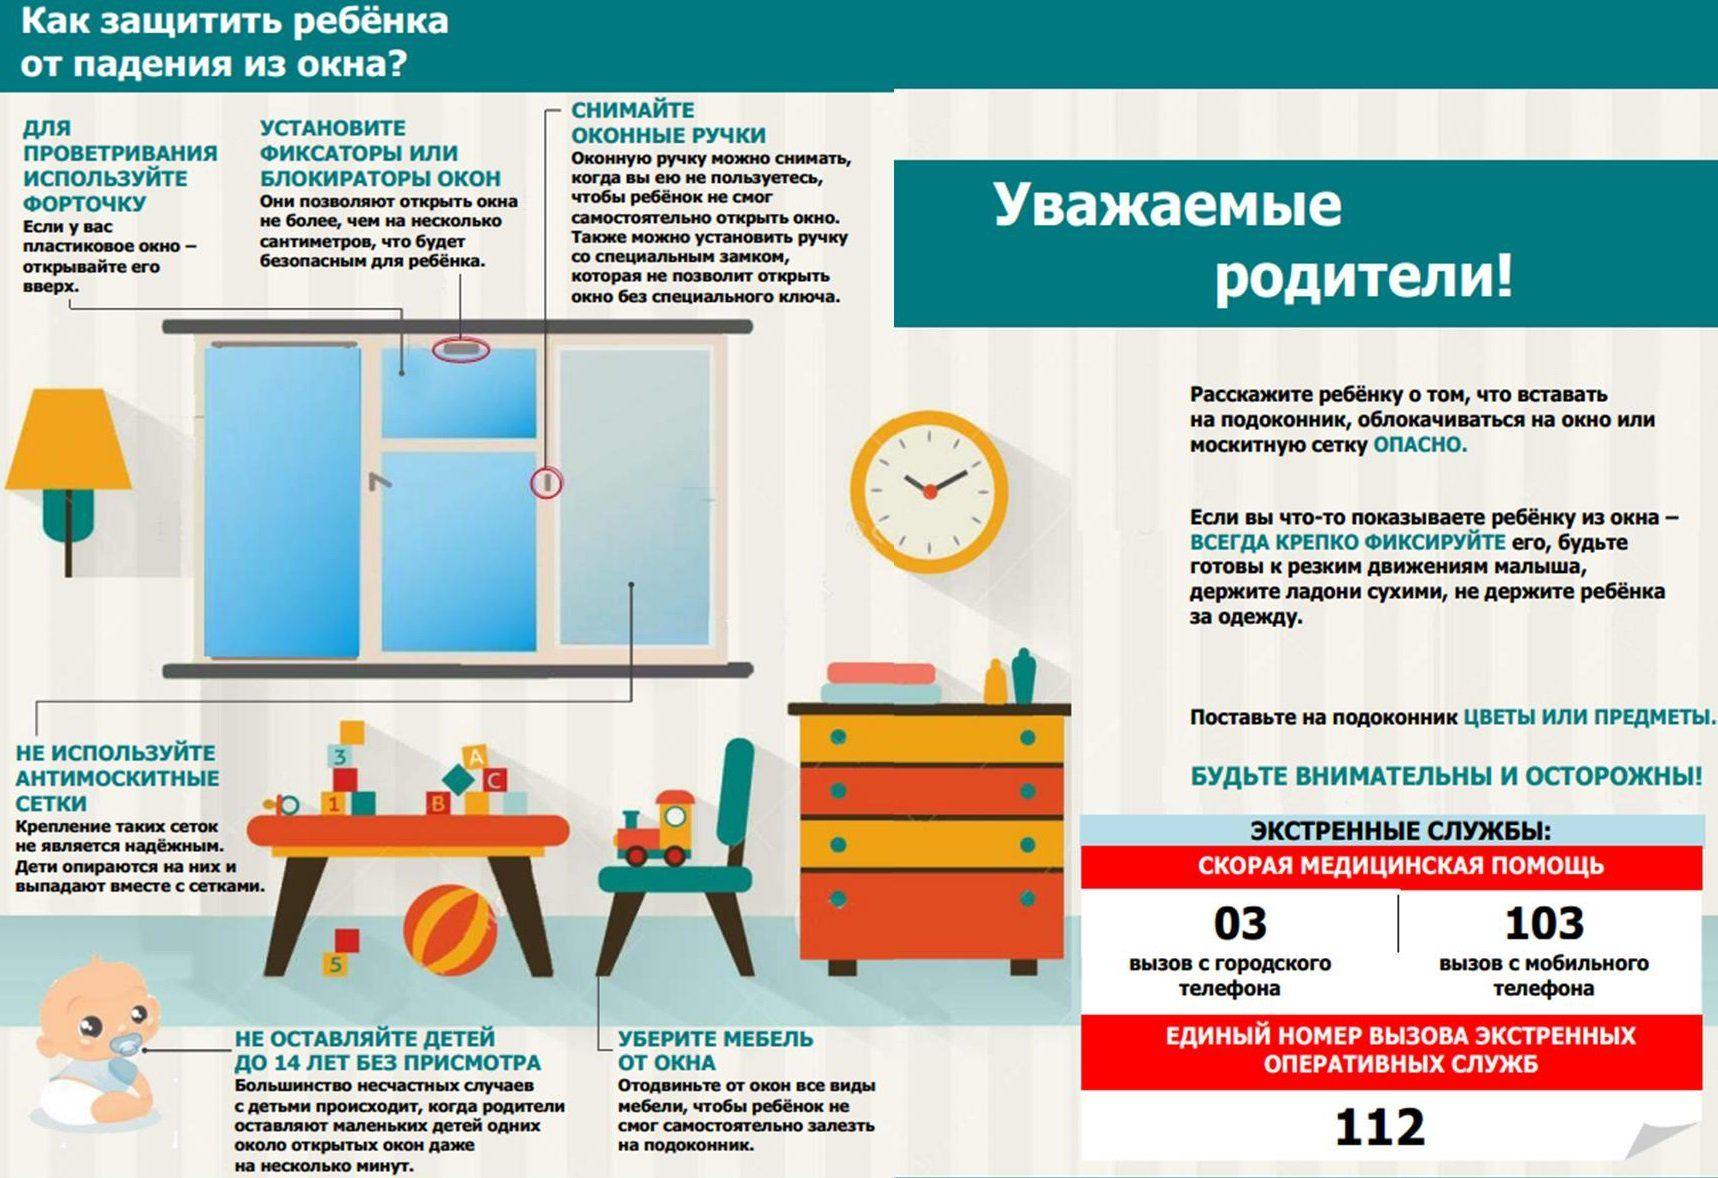 b_0_0_0_00_http___sadmolodej.ru_wp-content_uploads_2020_06_Prilozhenie41.jpg